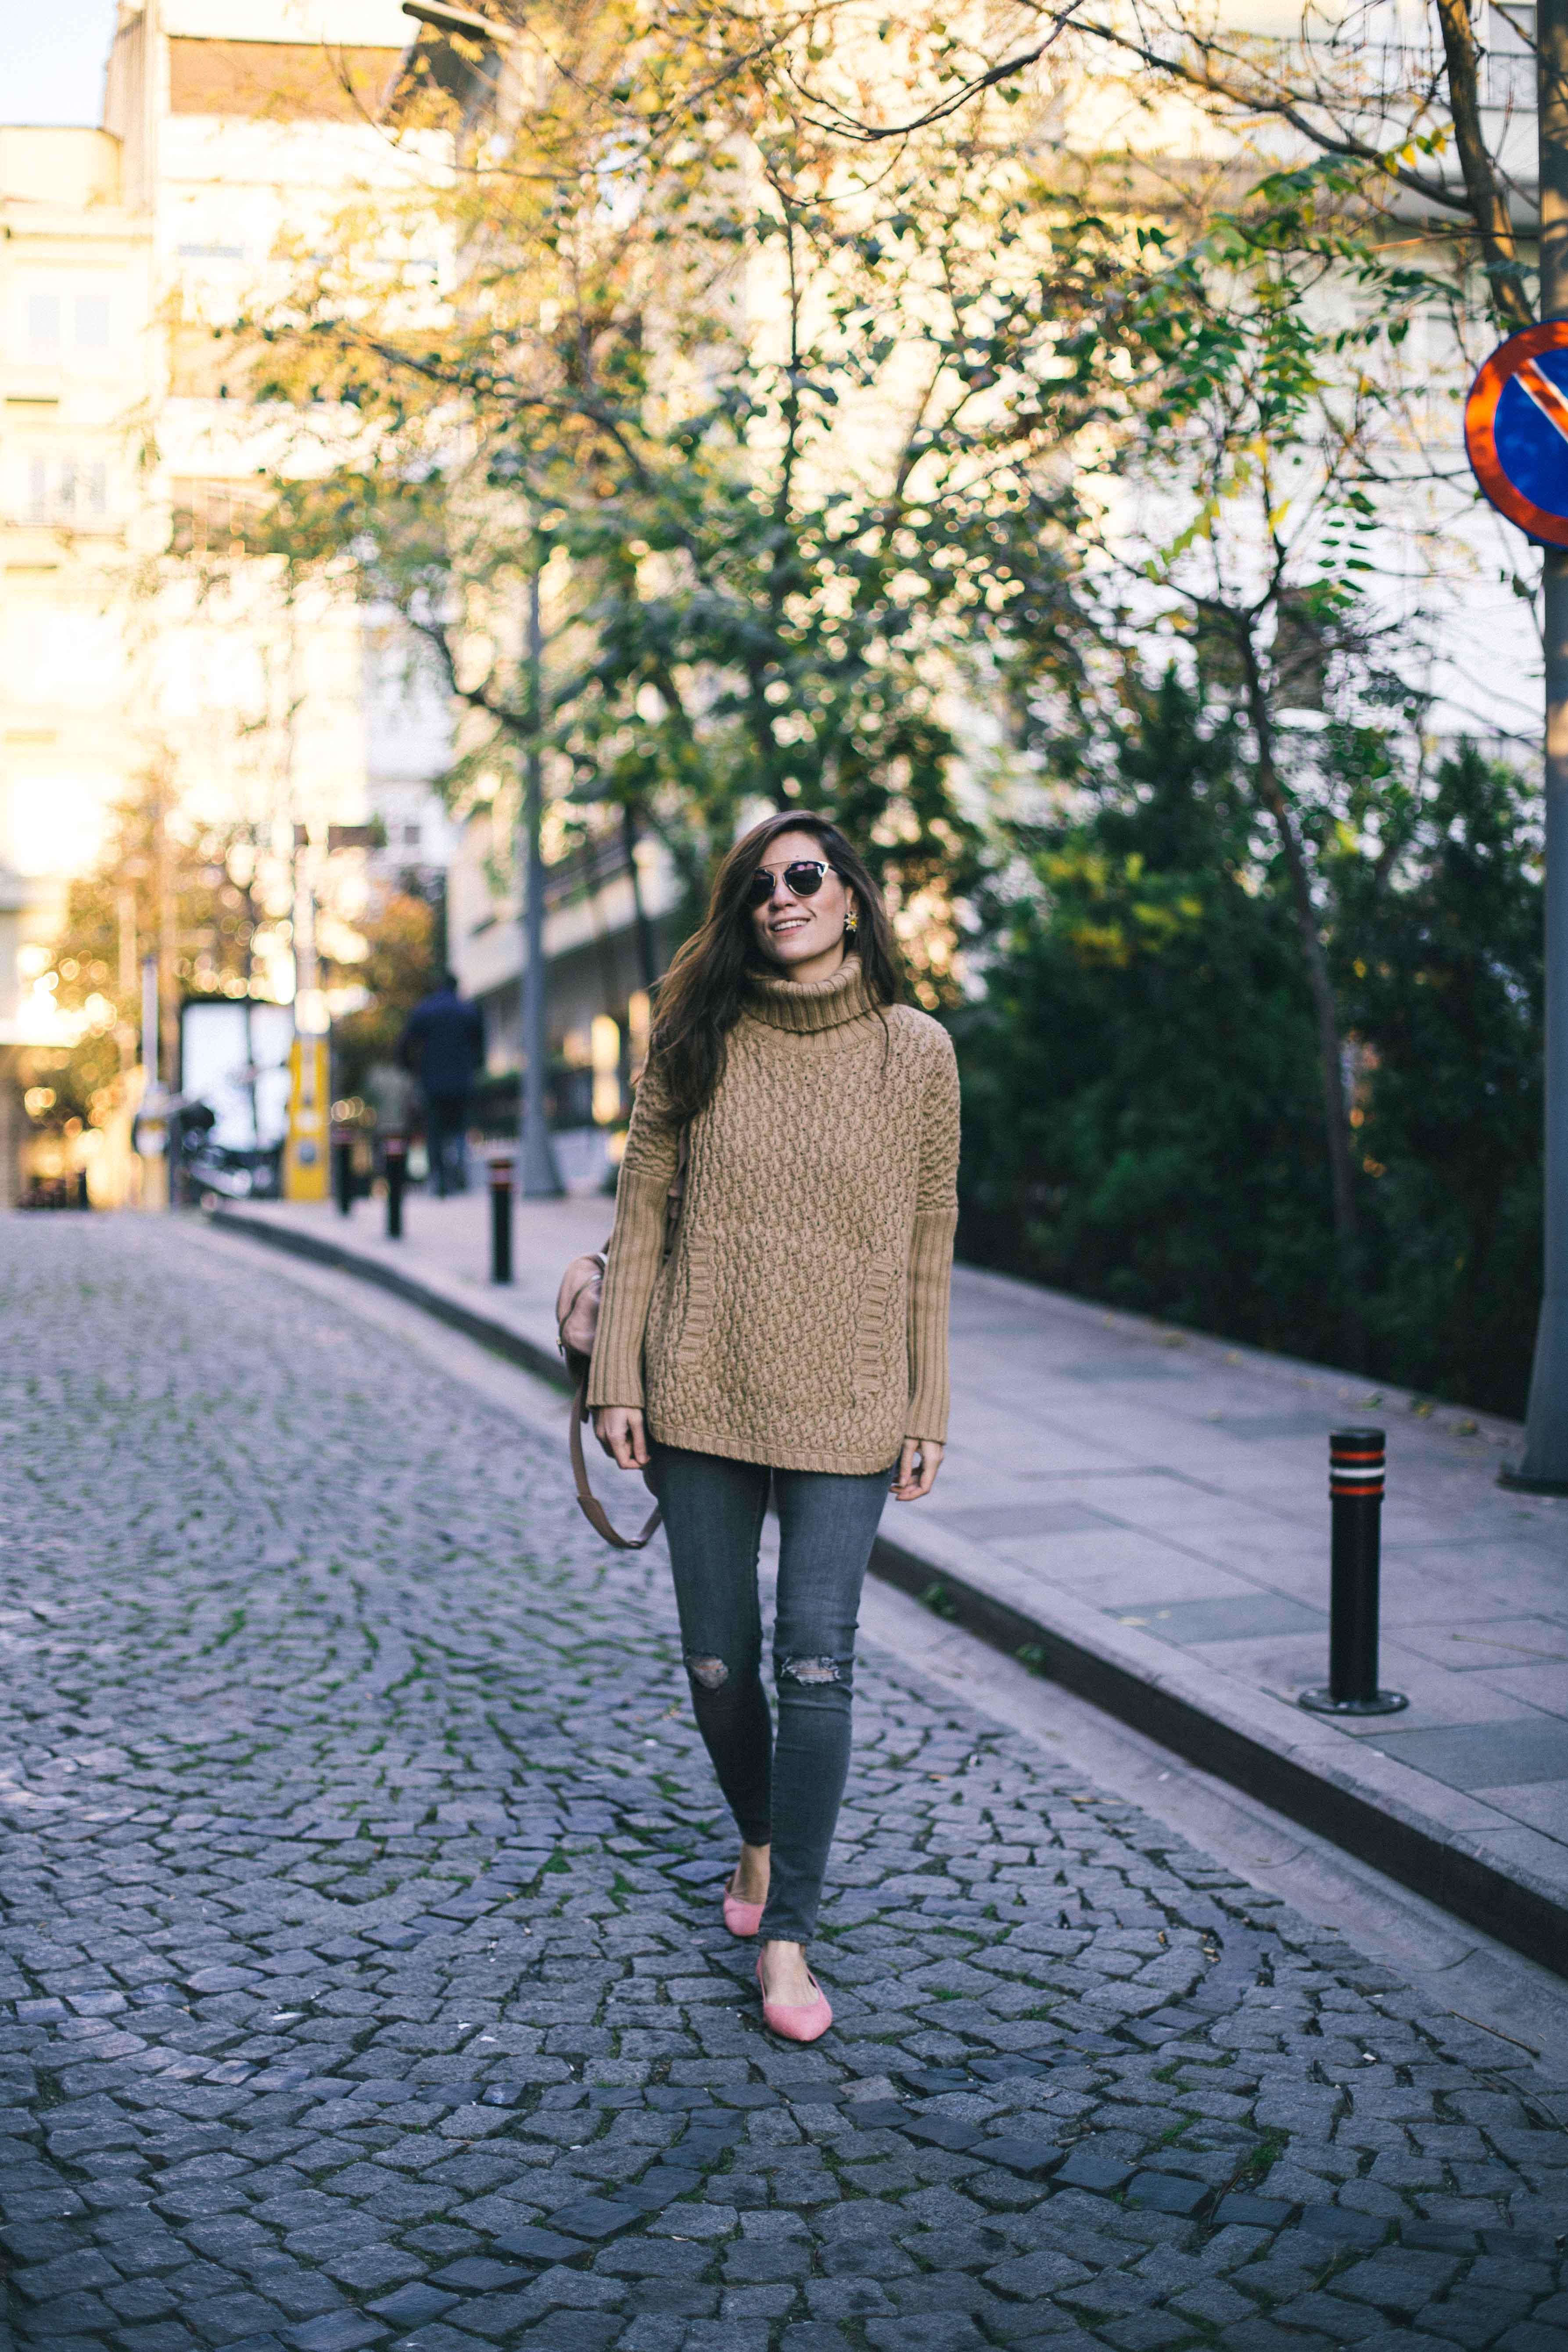 billur saatci, offnegiysem, turkish style blogger, street style, fashion, ootd, blogger, istanbul, mavi, mavi gold, massimo dutti, alexander wang, dior, marc by marc jacobs